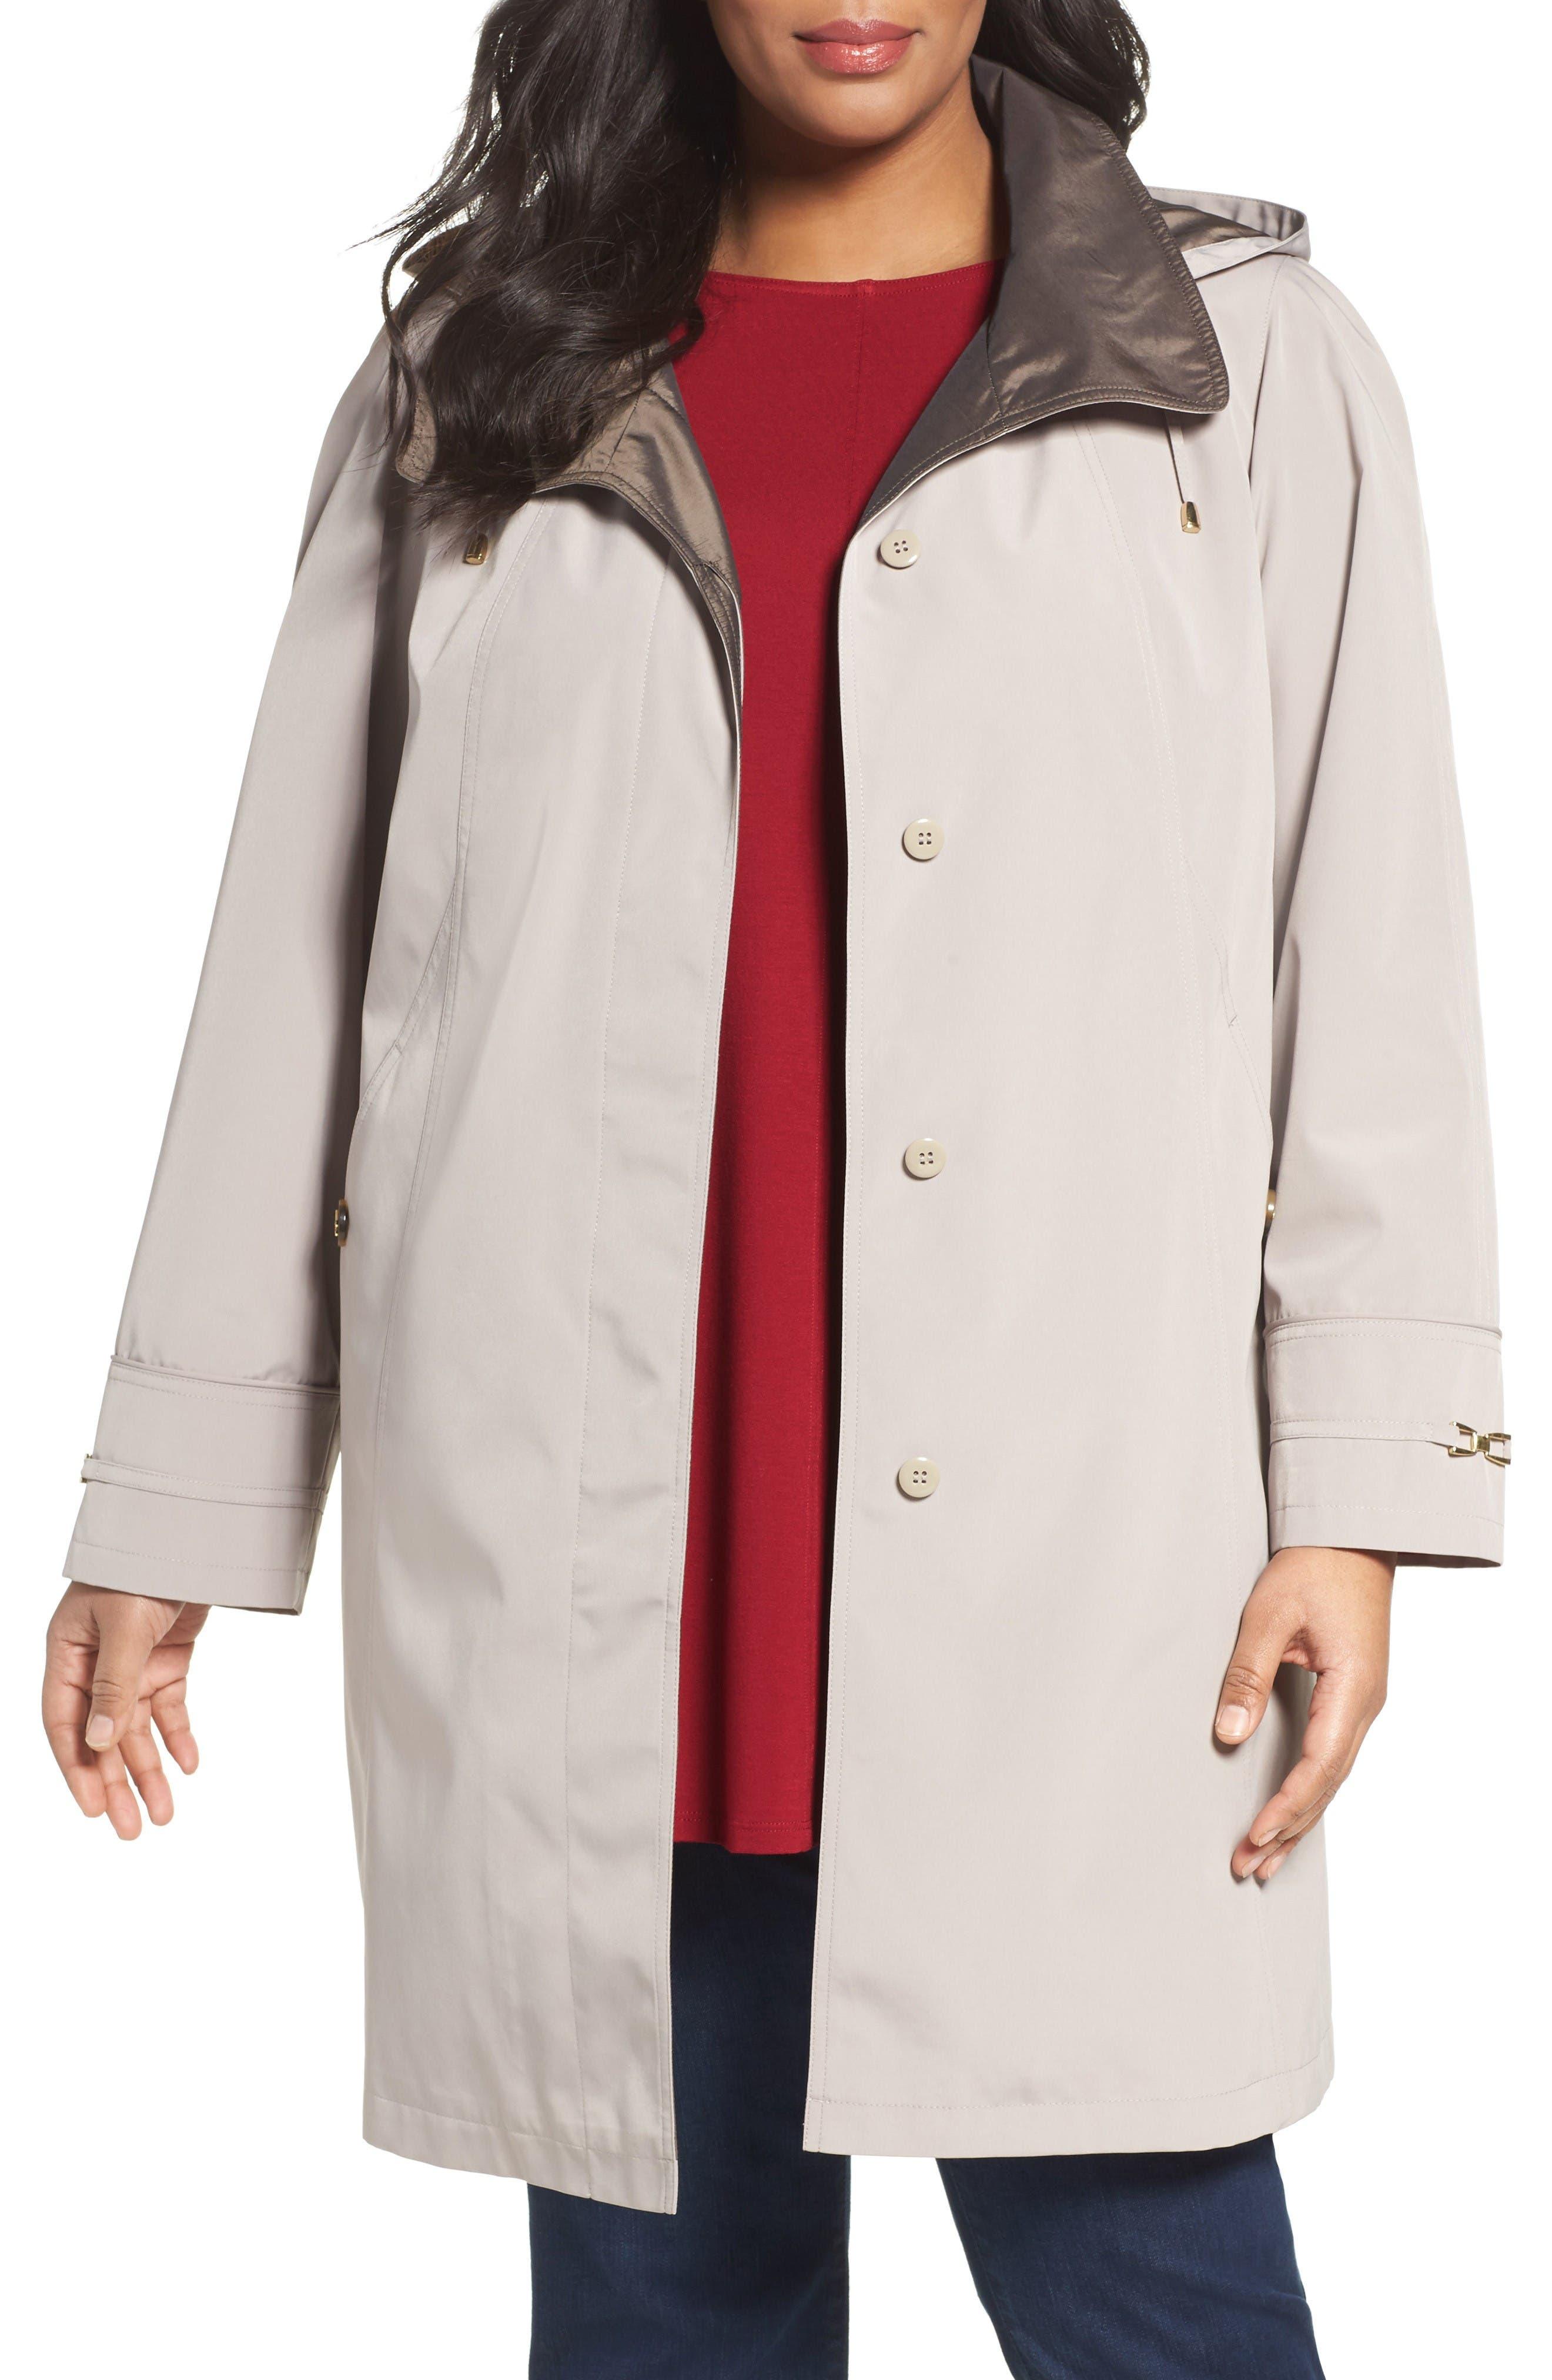 GALLERY Embossed Collar Raincoat with Detachable Hood